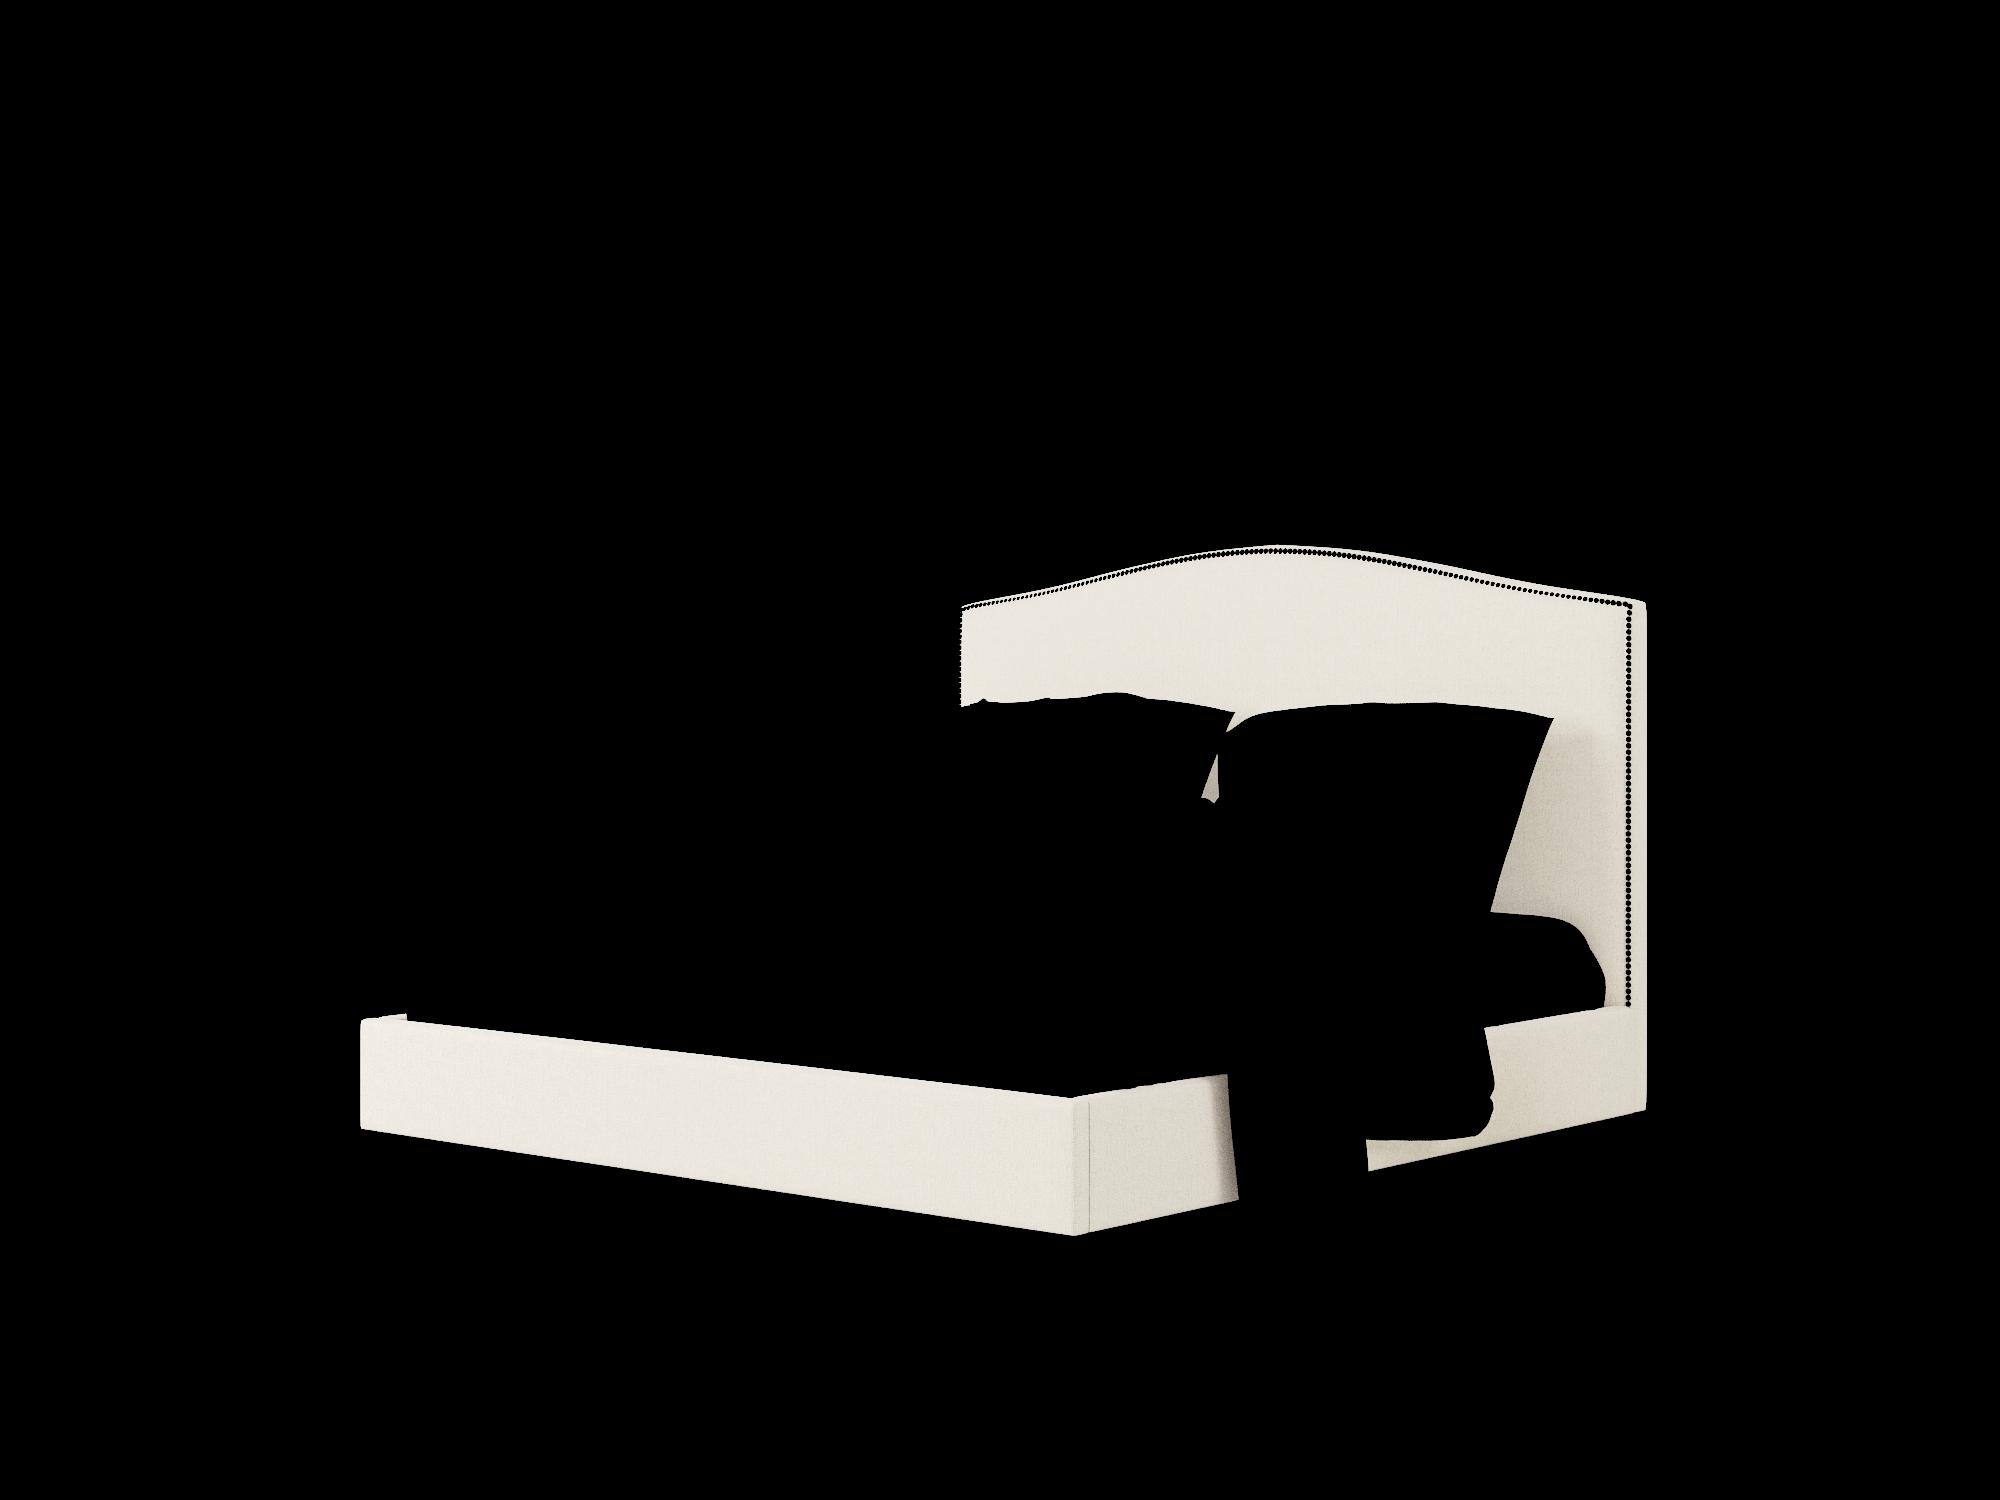 Dalion Sasha Linen Bed King Room Texture